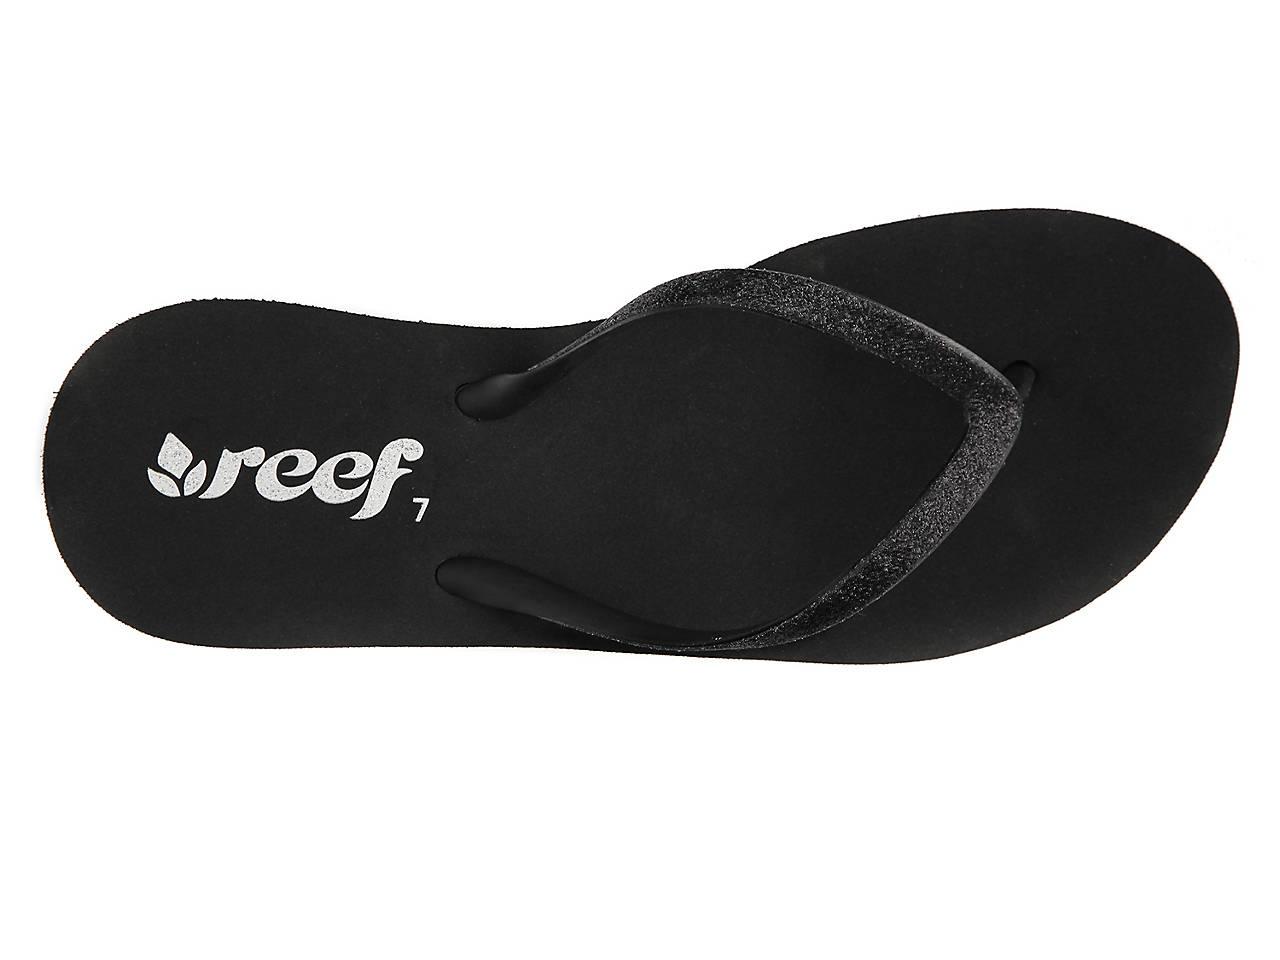 e14a6a27677 Reef Krystal Star Wedge Sandal Women s Shoes